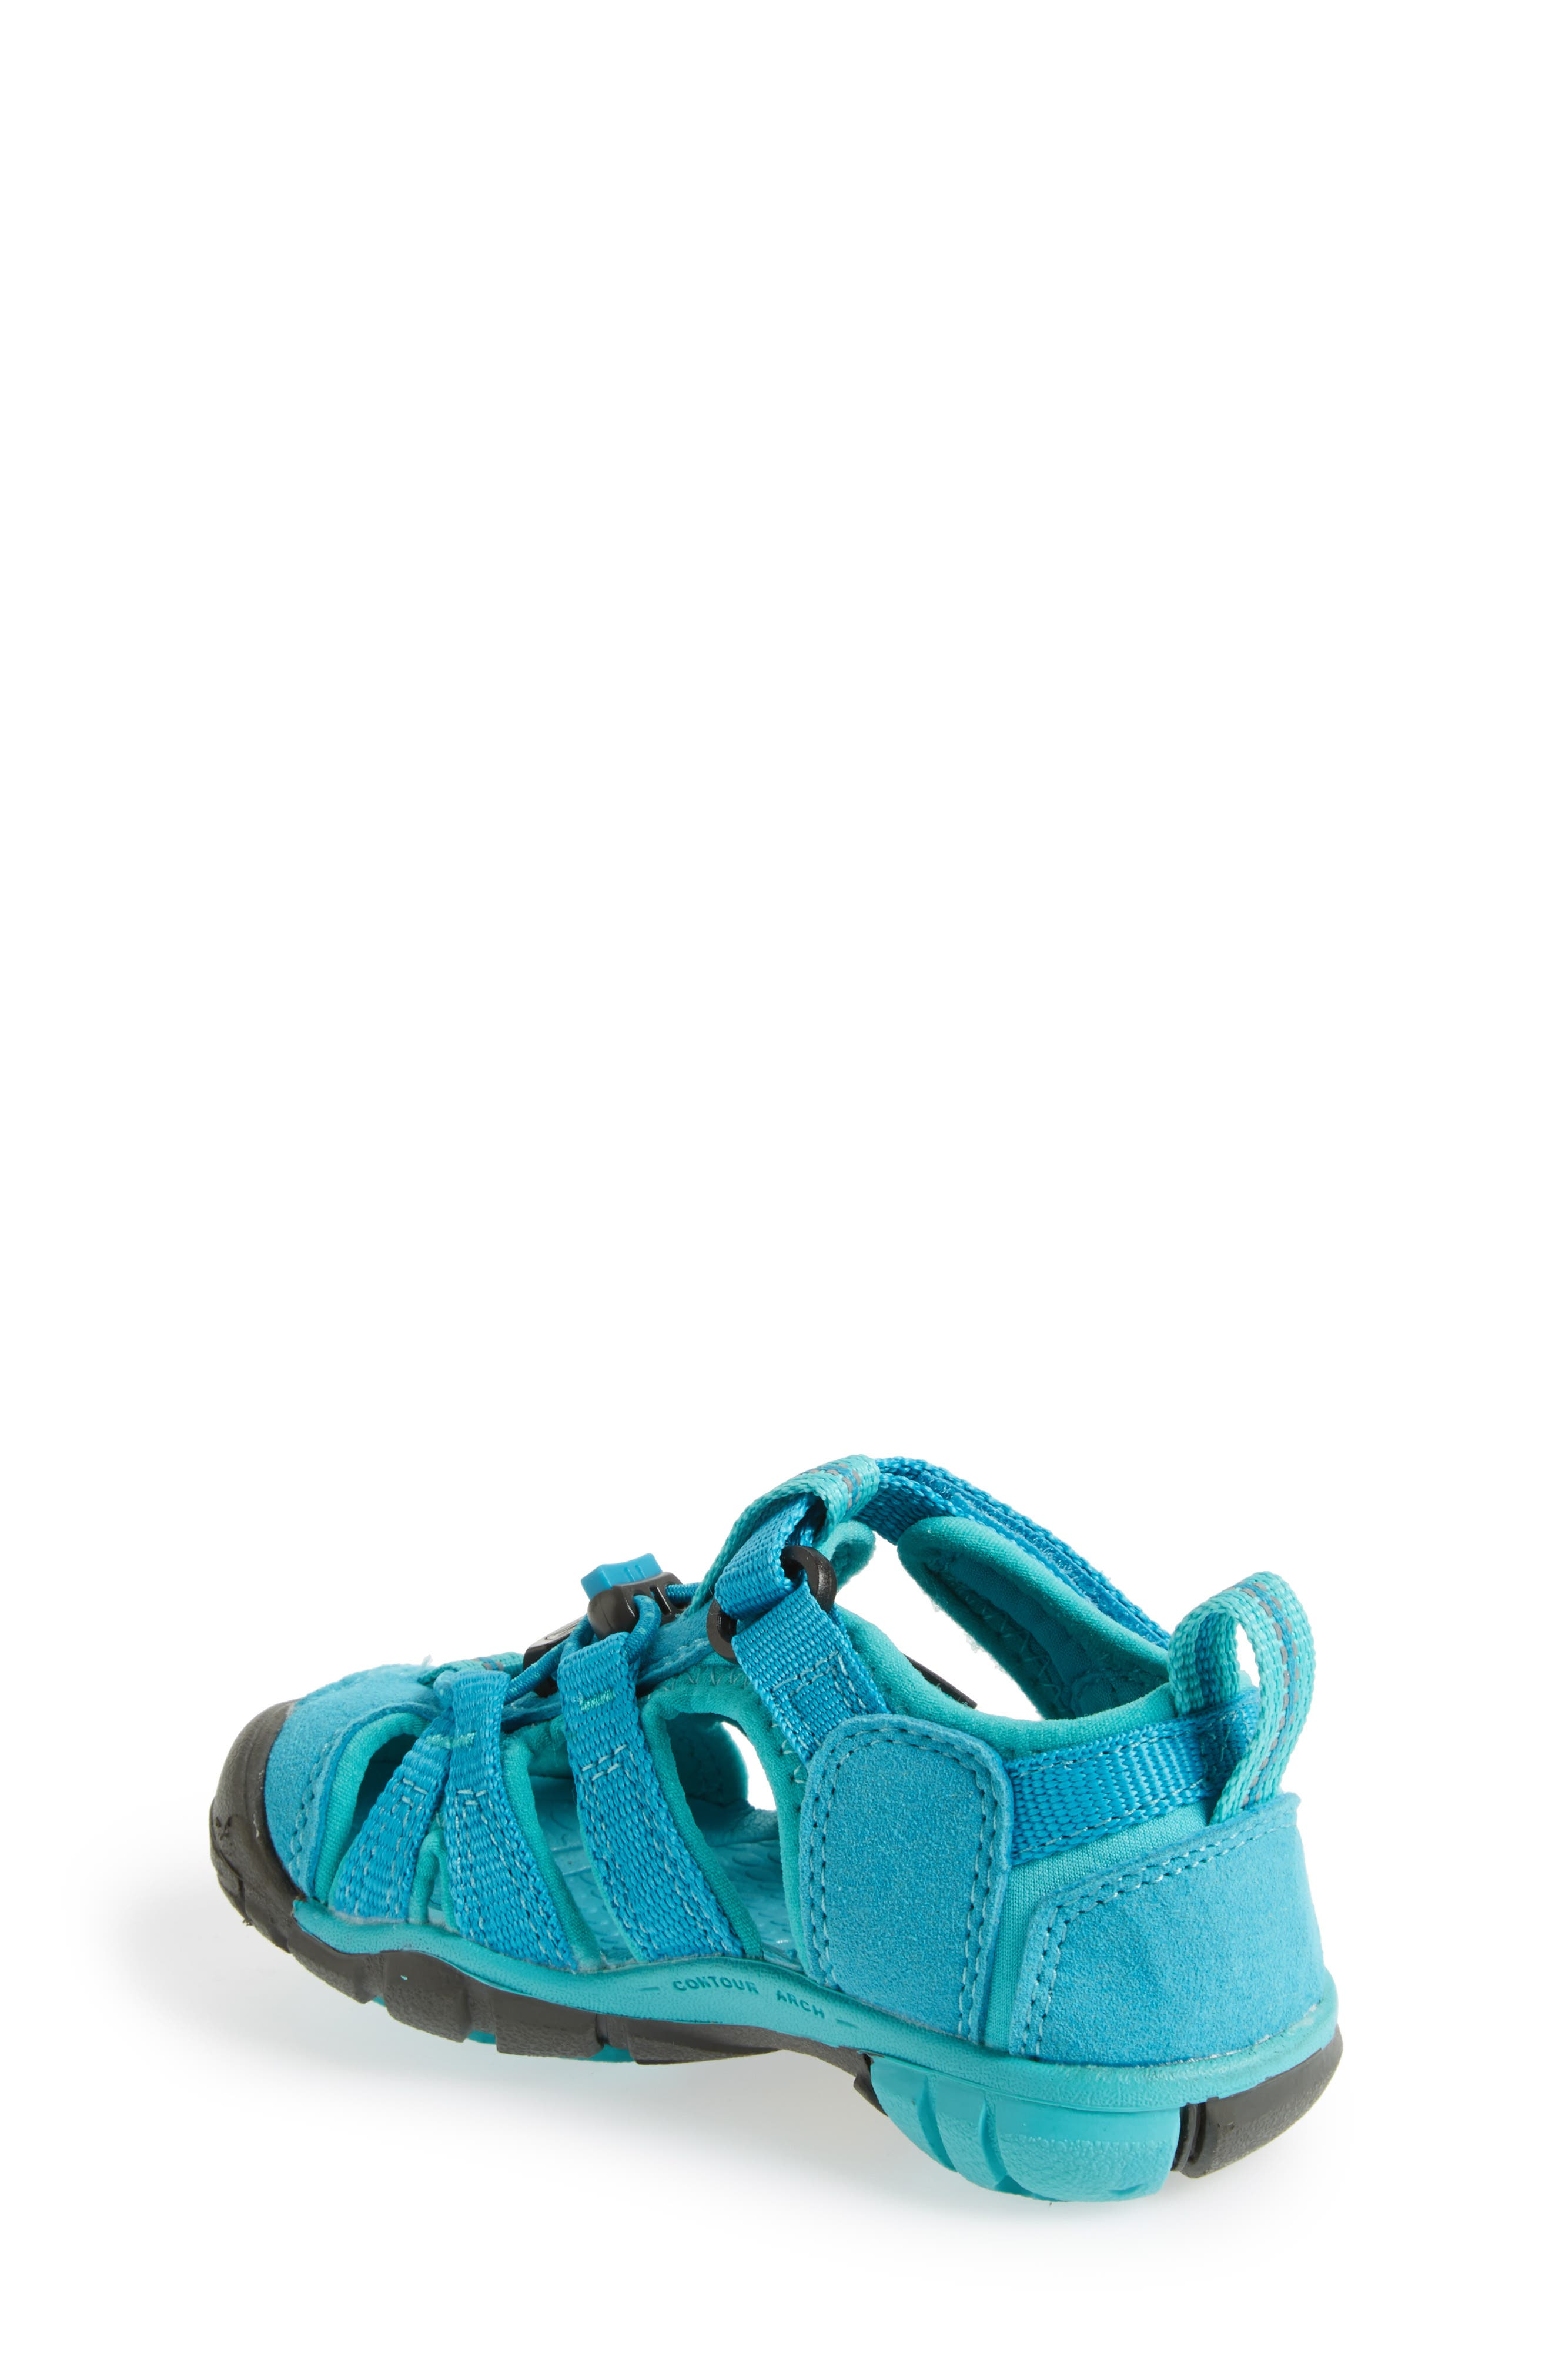 ,                             'Seacamp II' Water Friendly Sandal,                             Main thumbnail 197, color,                             440